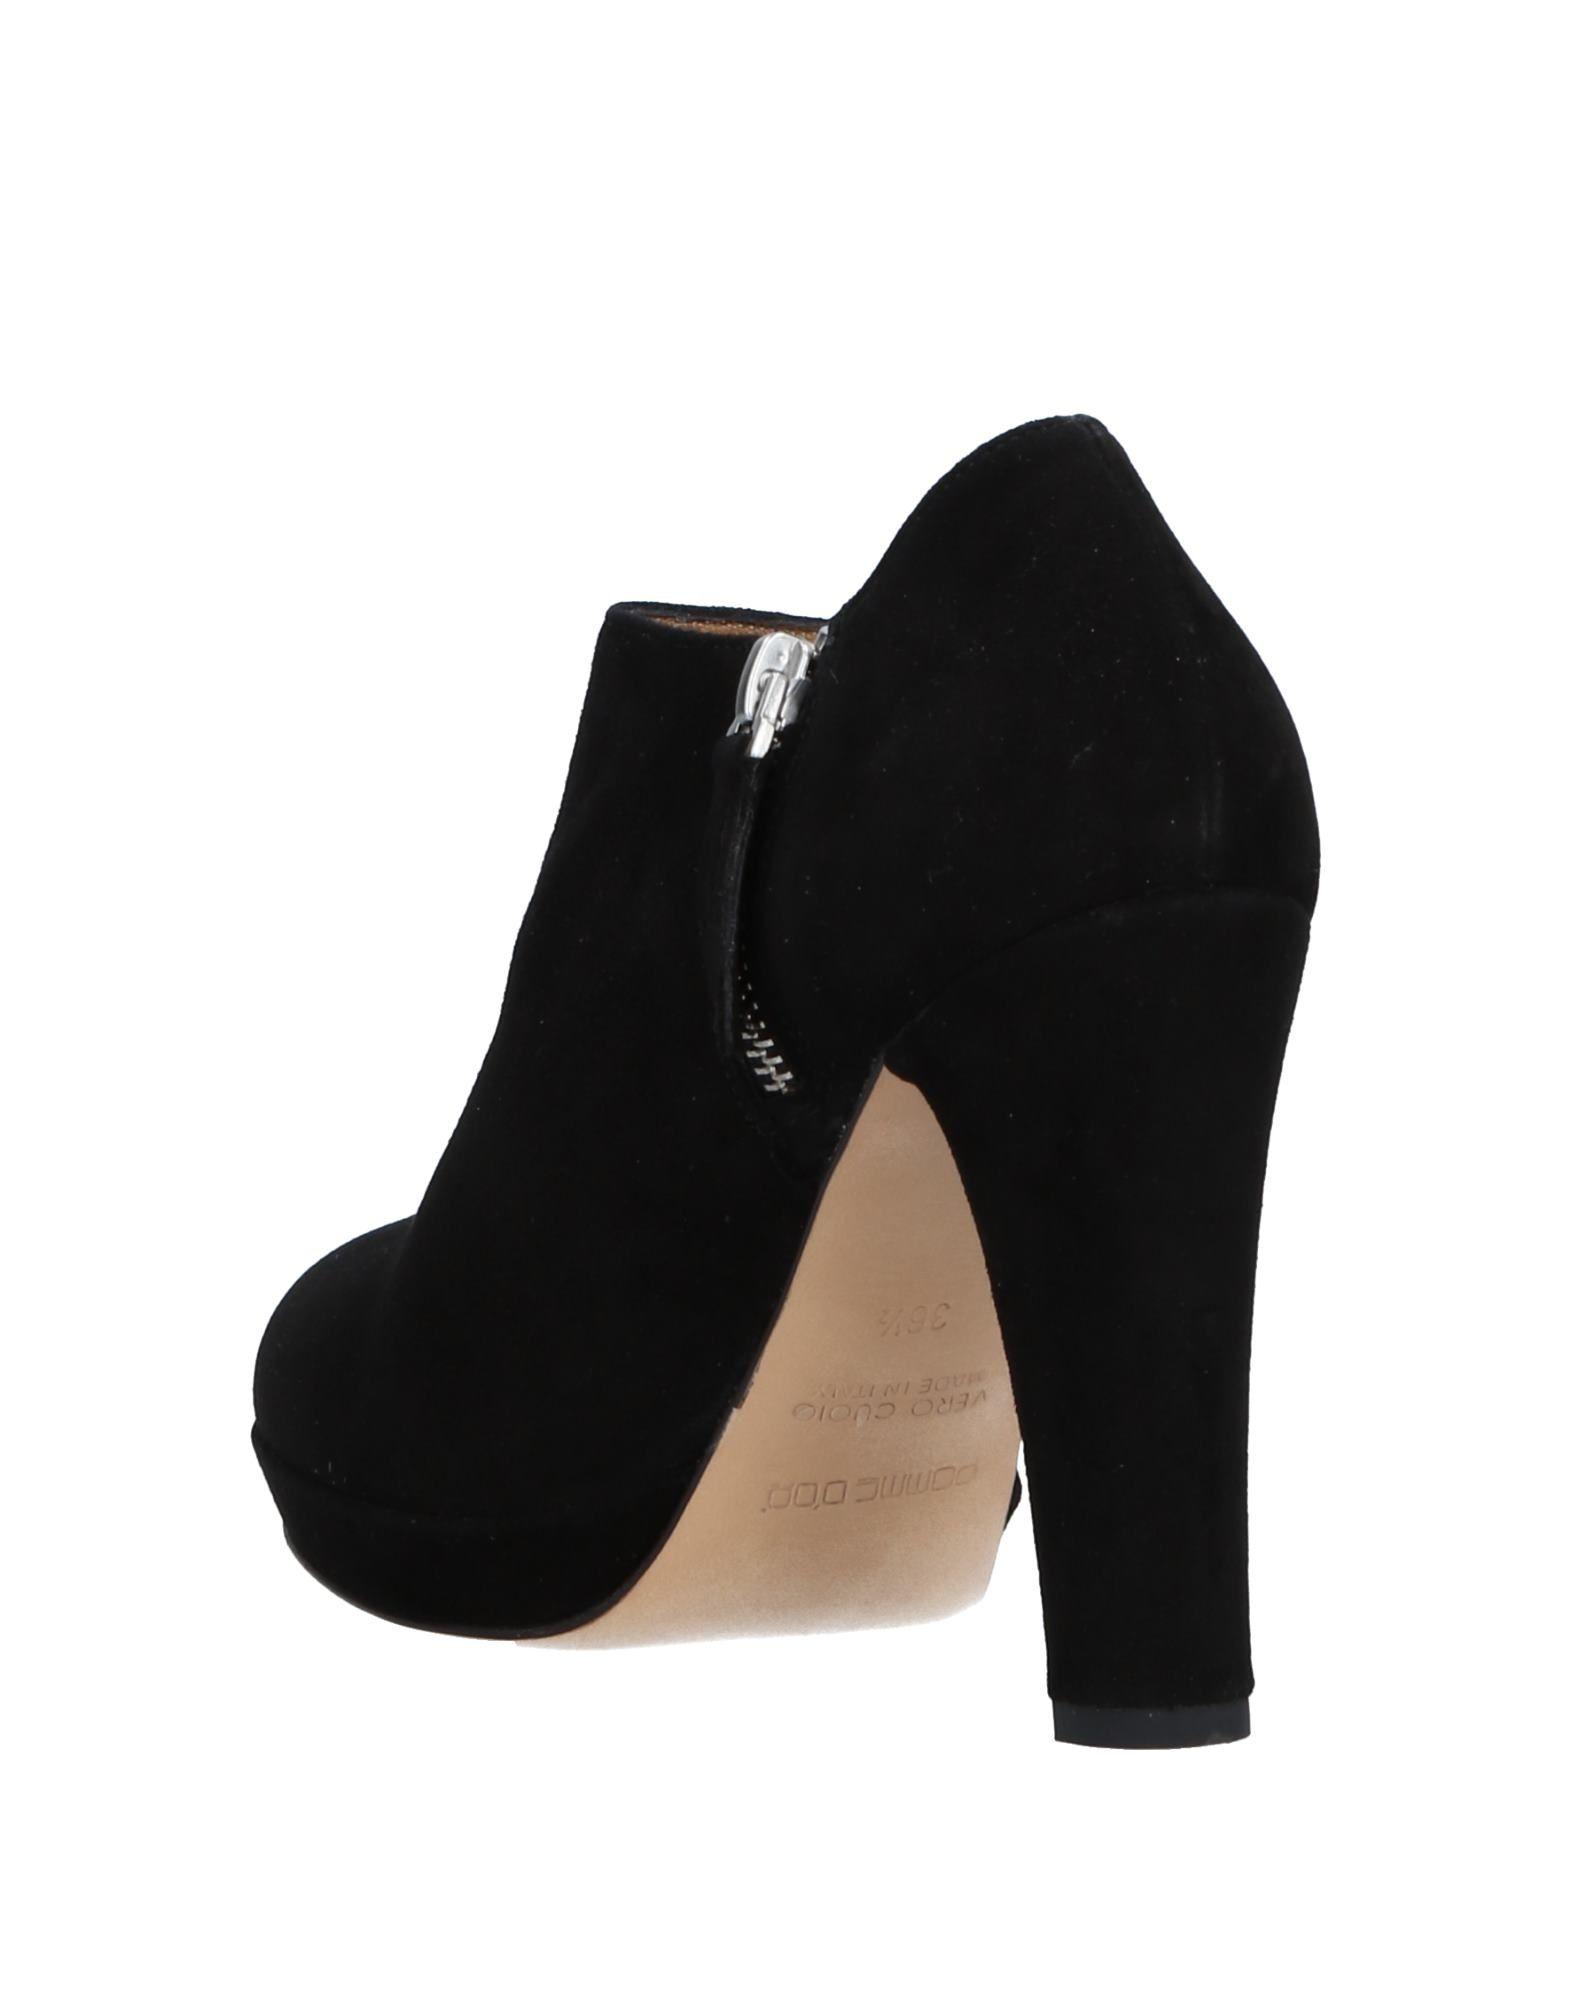 Pomme D'or Stiefelette strapazierfähige Damen  11537450HDGut aussehende strapazierfähige Stiefelette Schuhe d7a85f